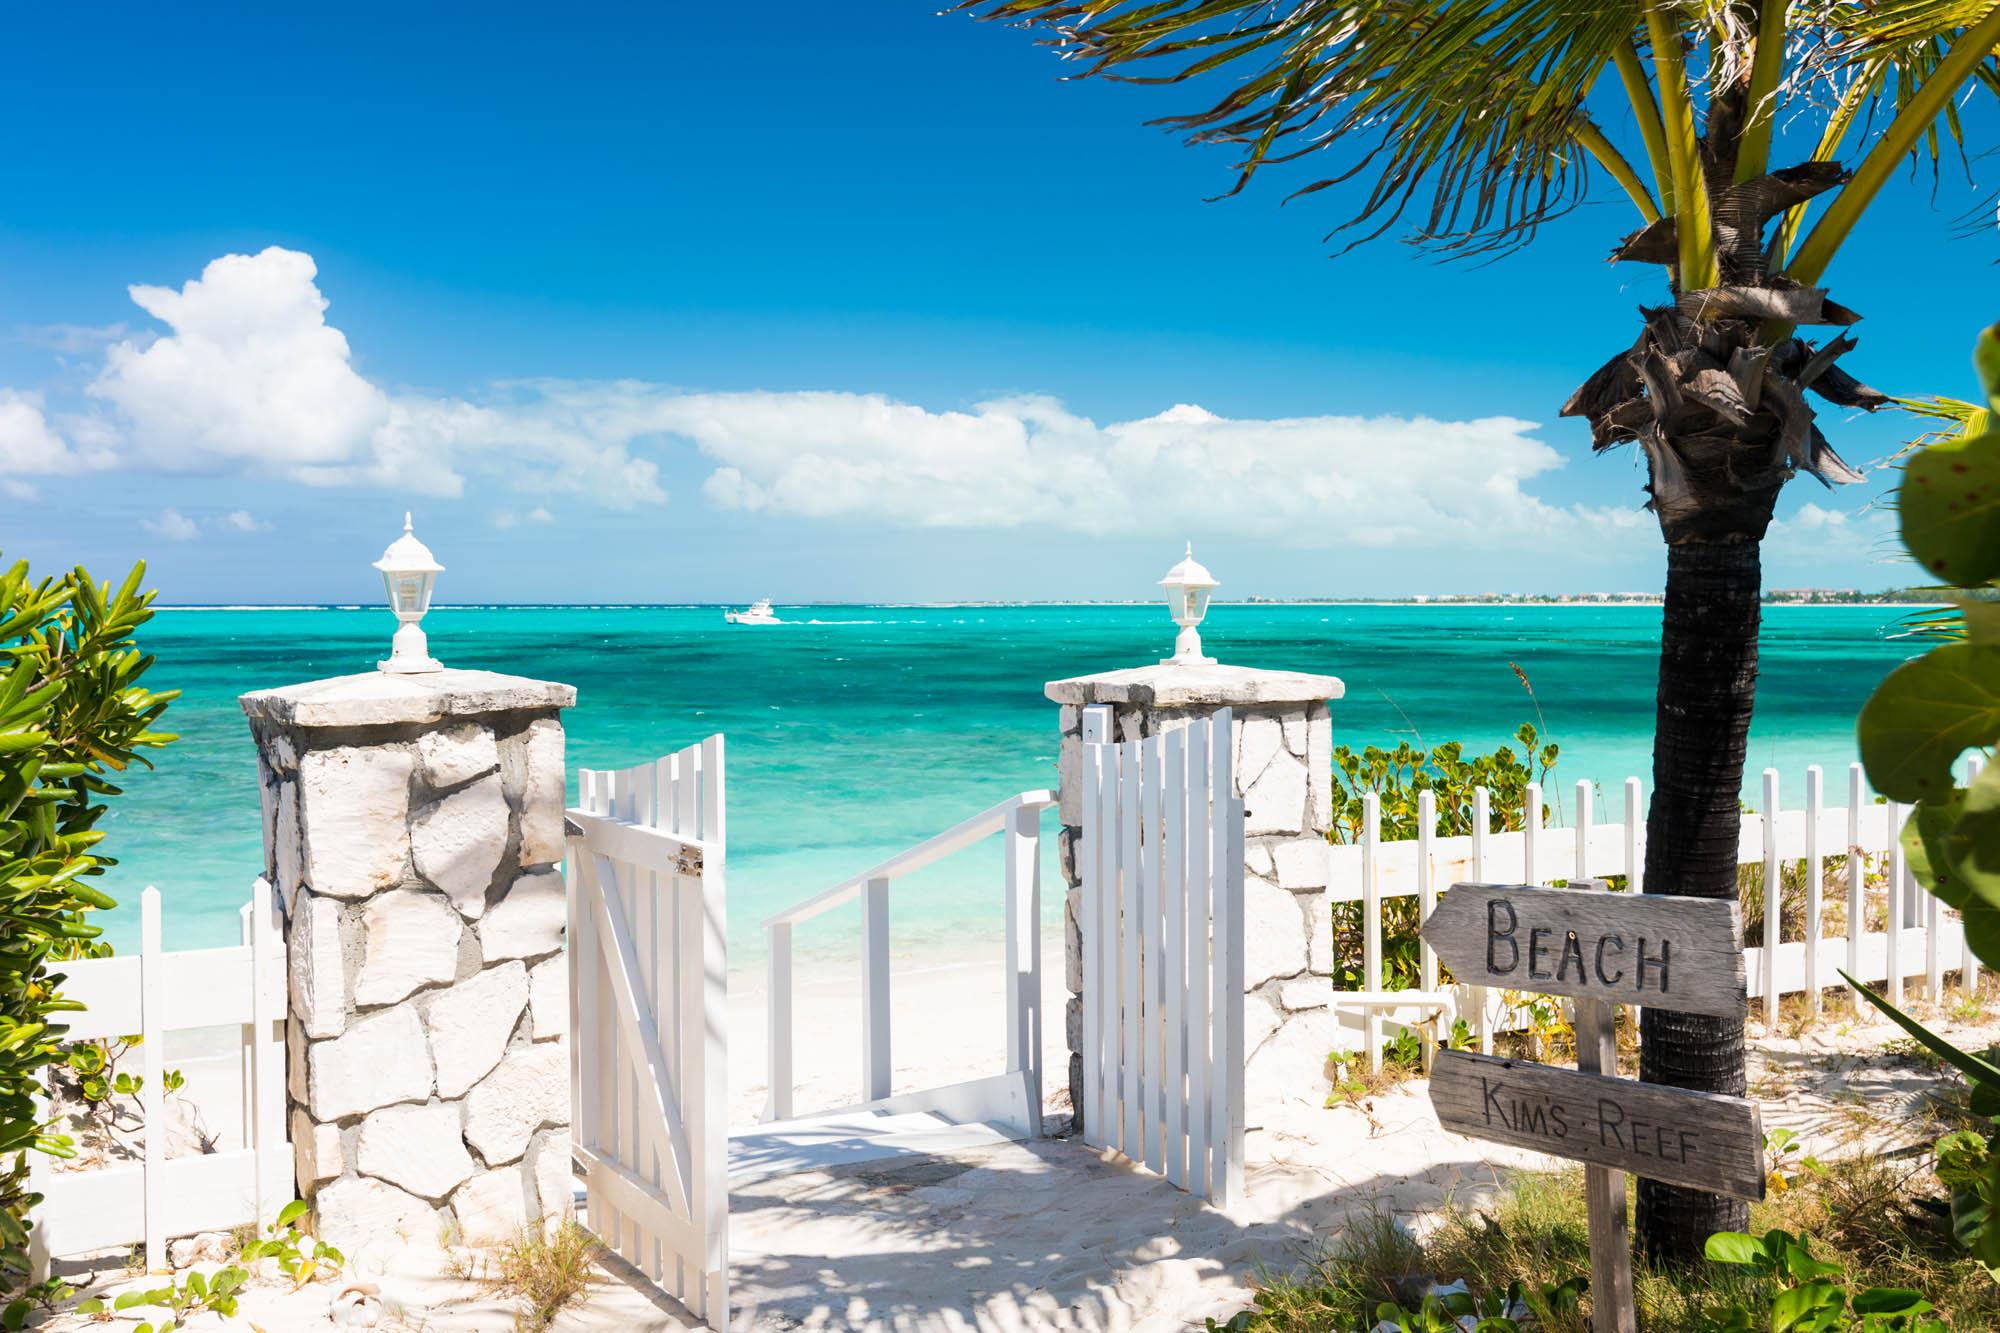 Feels Like A Private Gateway To Heaven At Reef Beach House Grace Bay